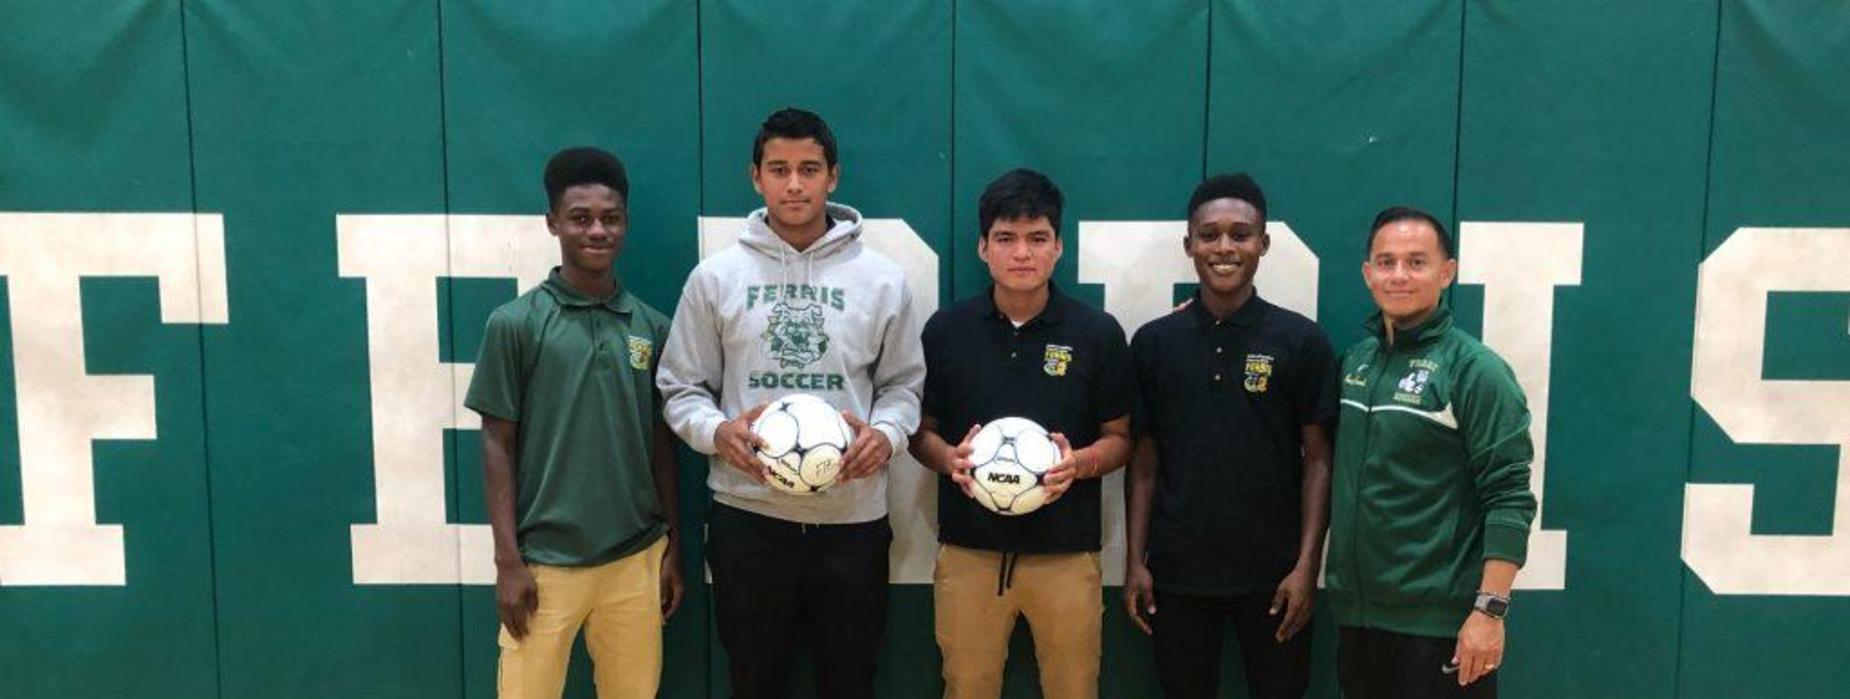 Ferris Boys Soccer team